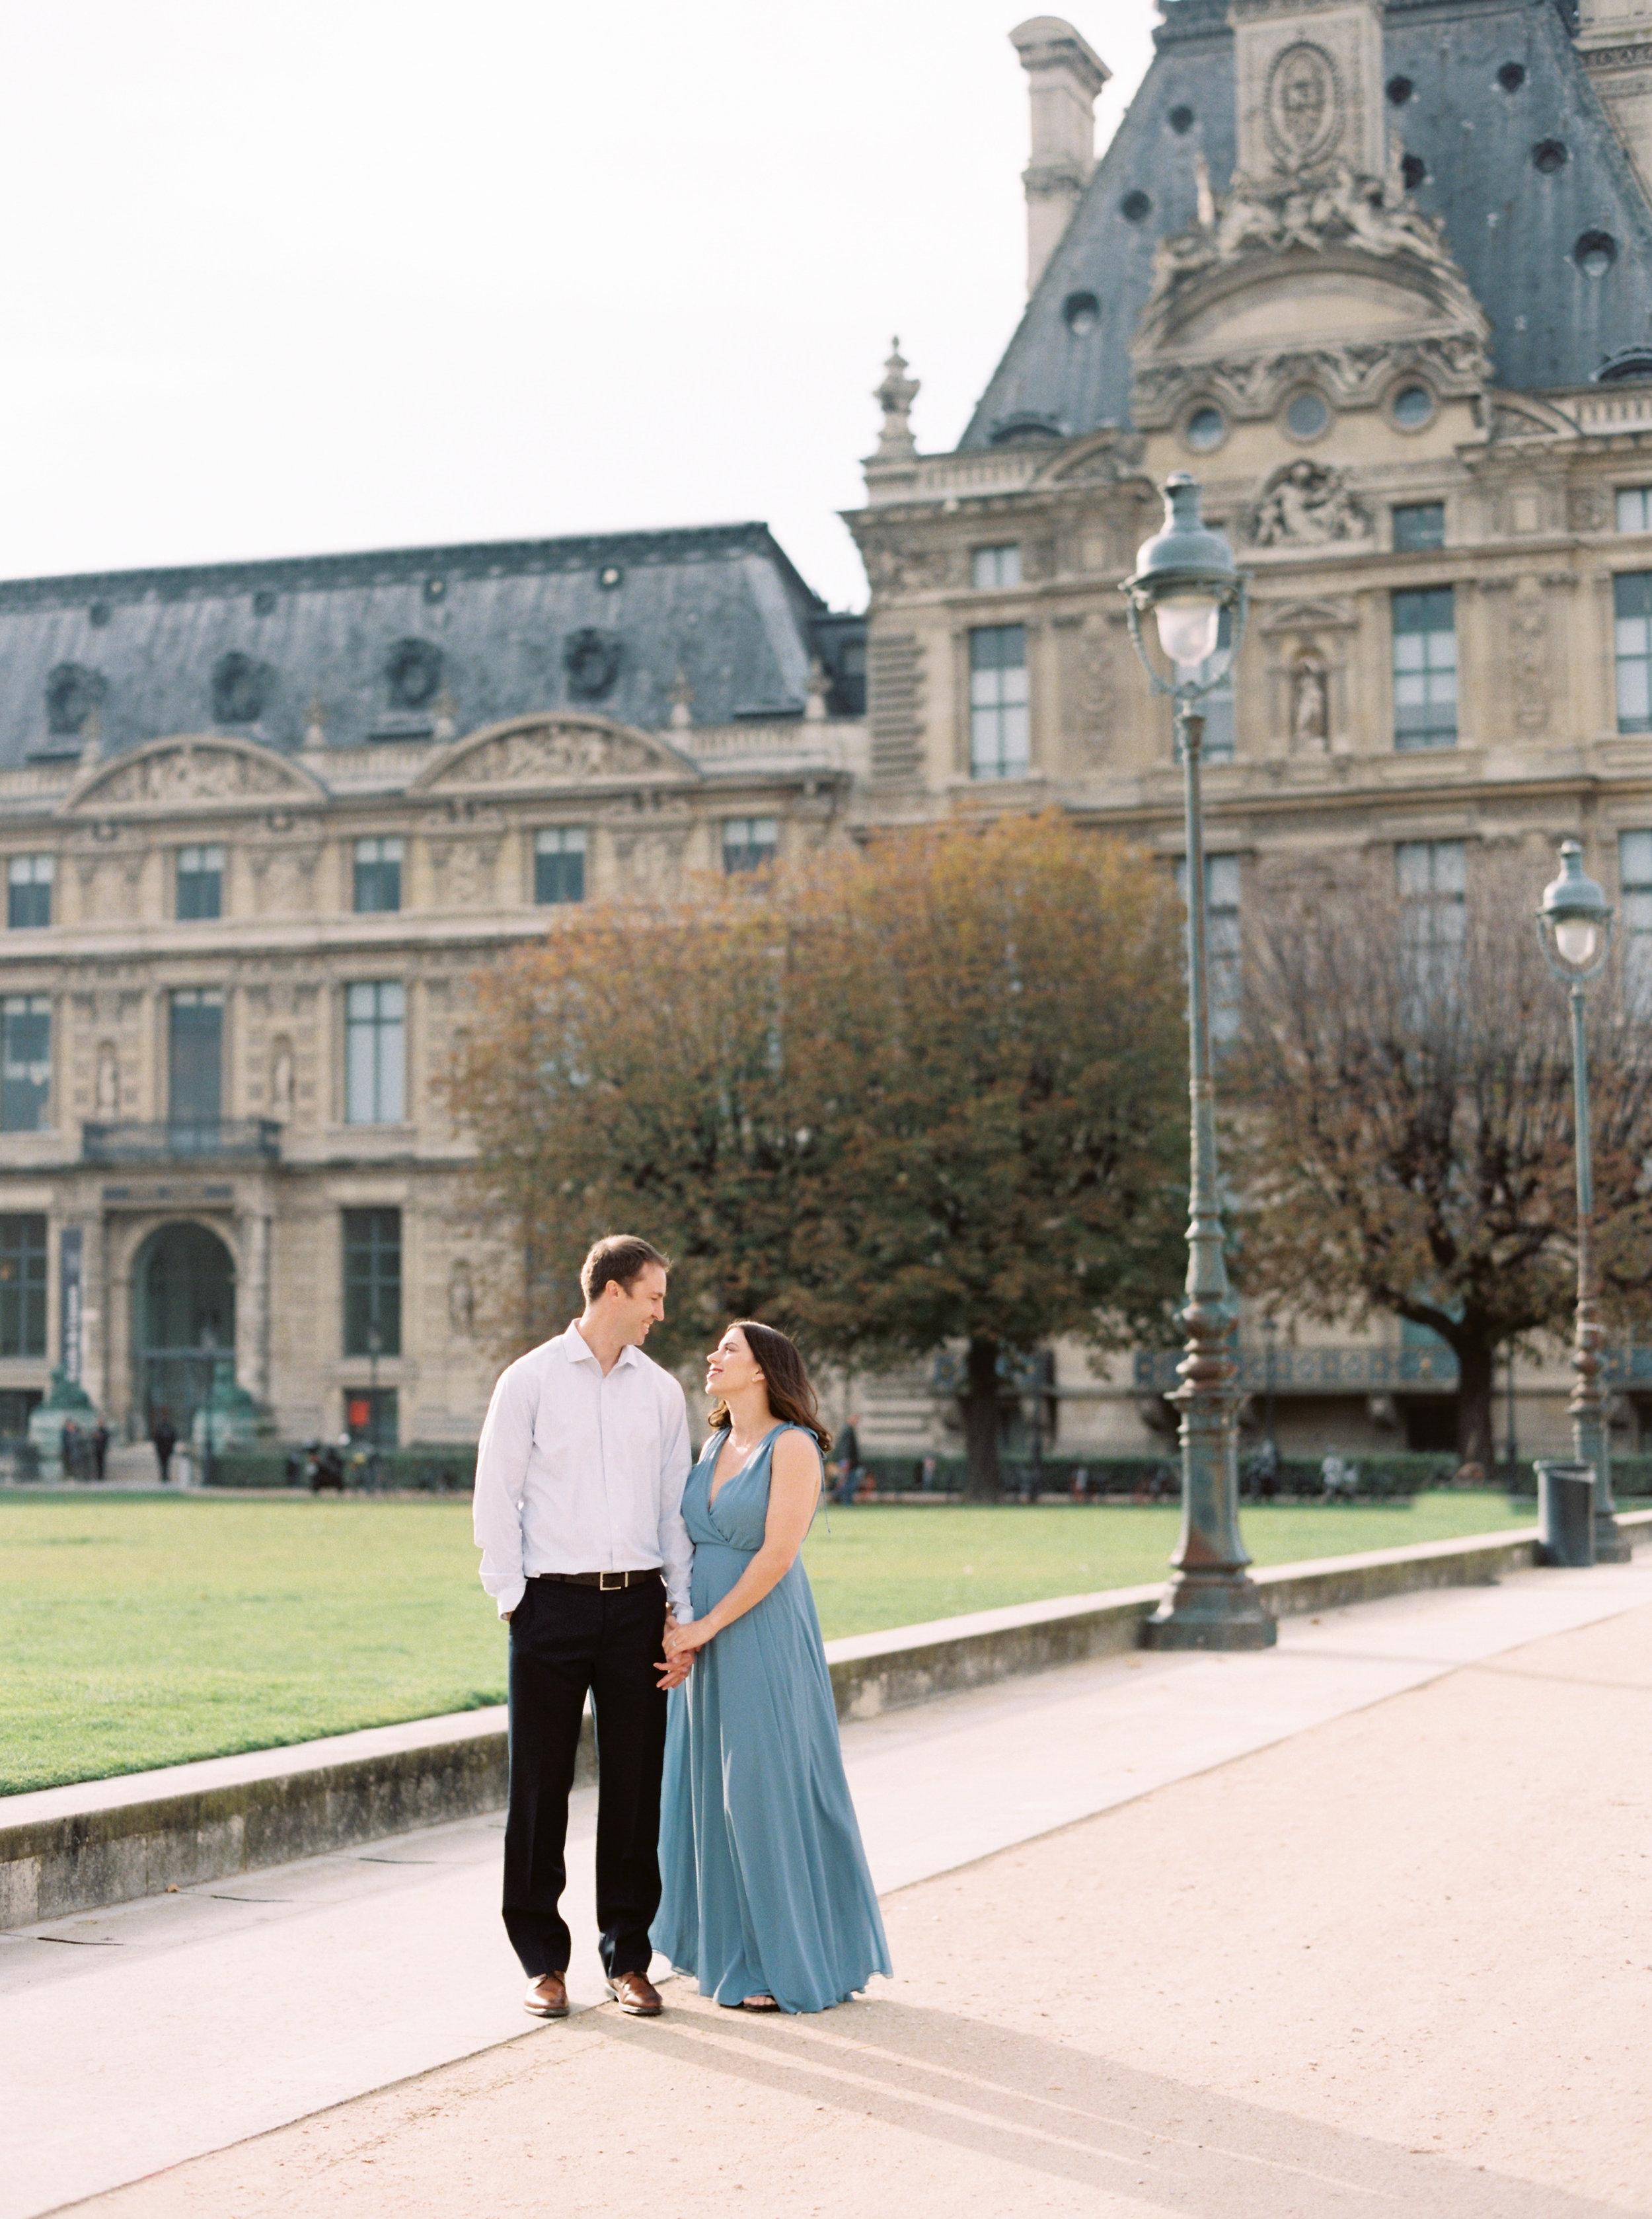 paris-france-wedding-photographer-destination-photographer-61.jpg